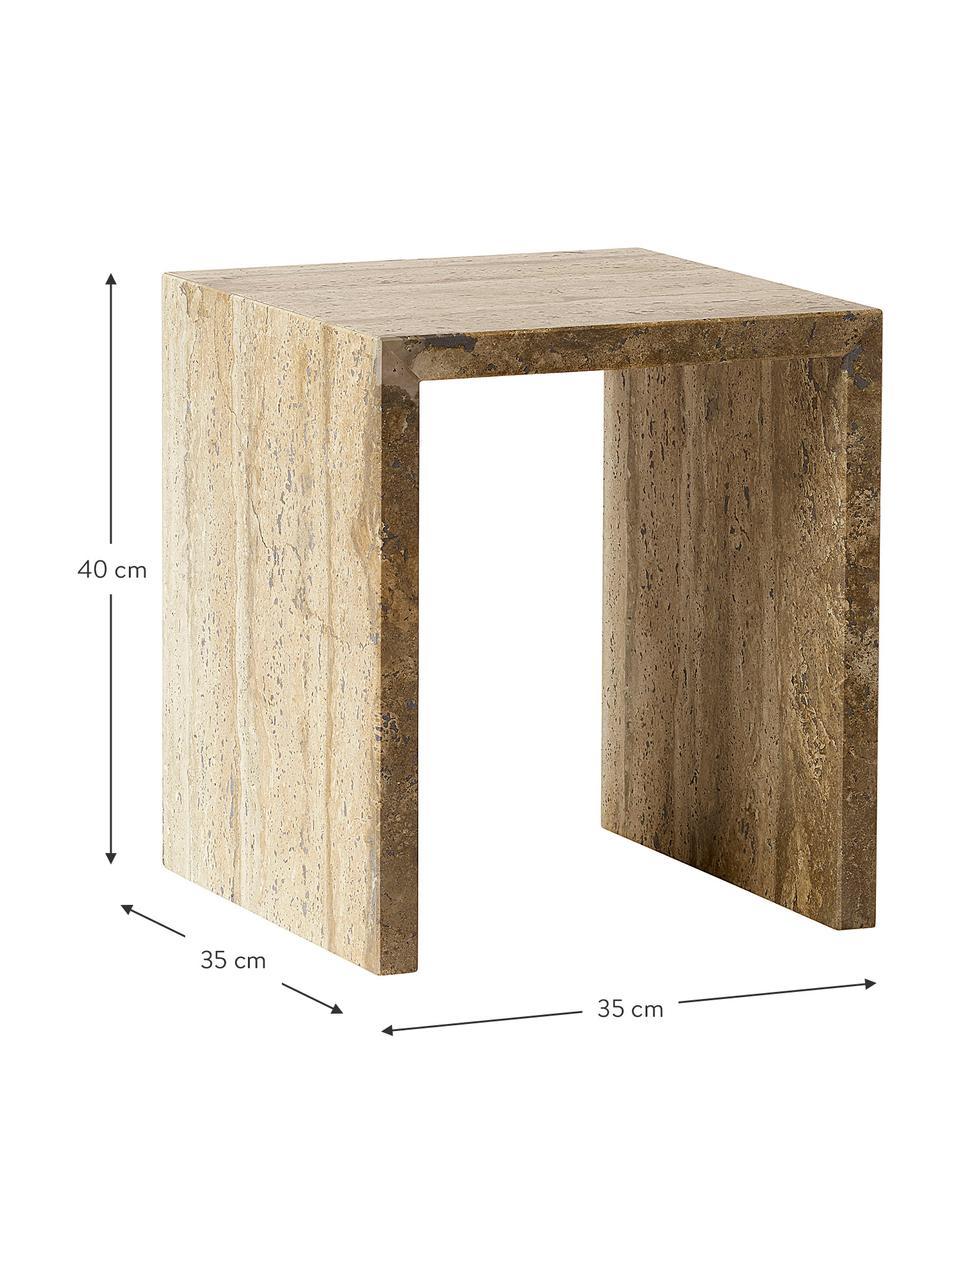 Tavolino design minimalista Travertin, Travertino, Beige, Larg. 35 x Prof. 35 cm